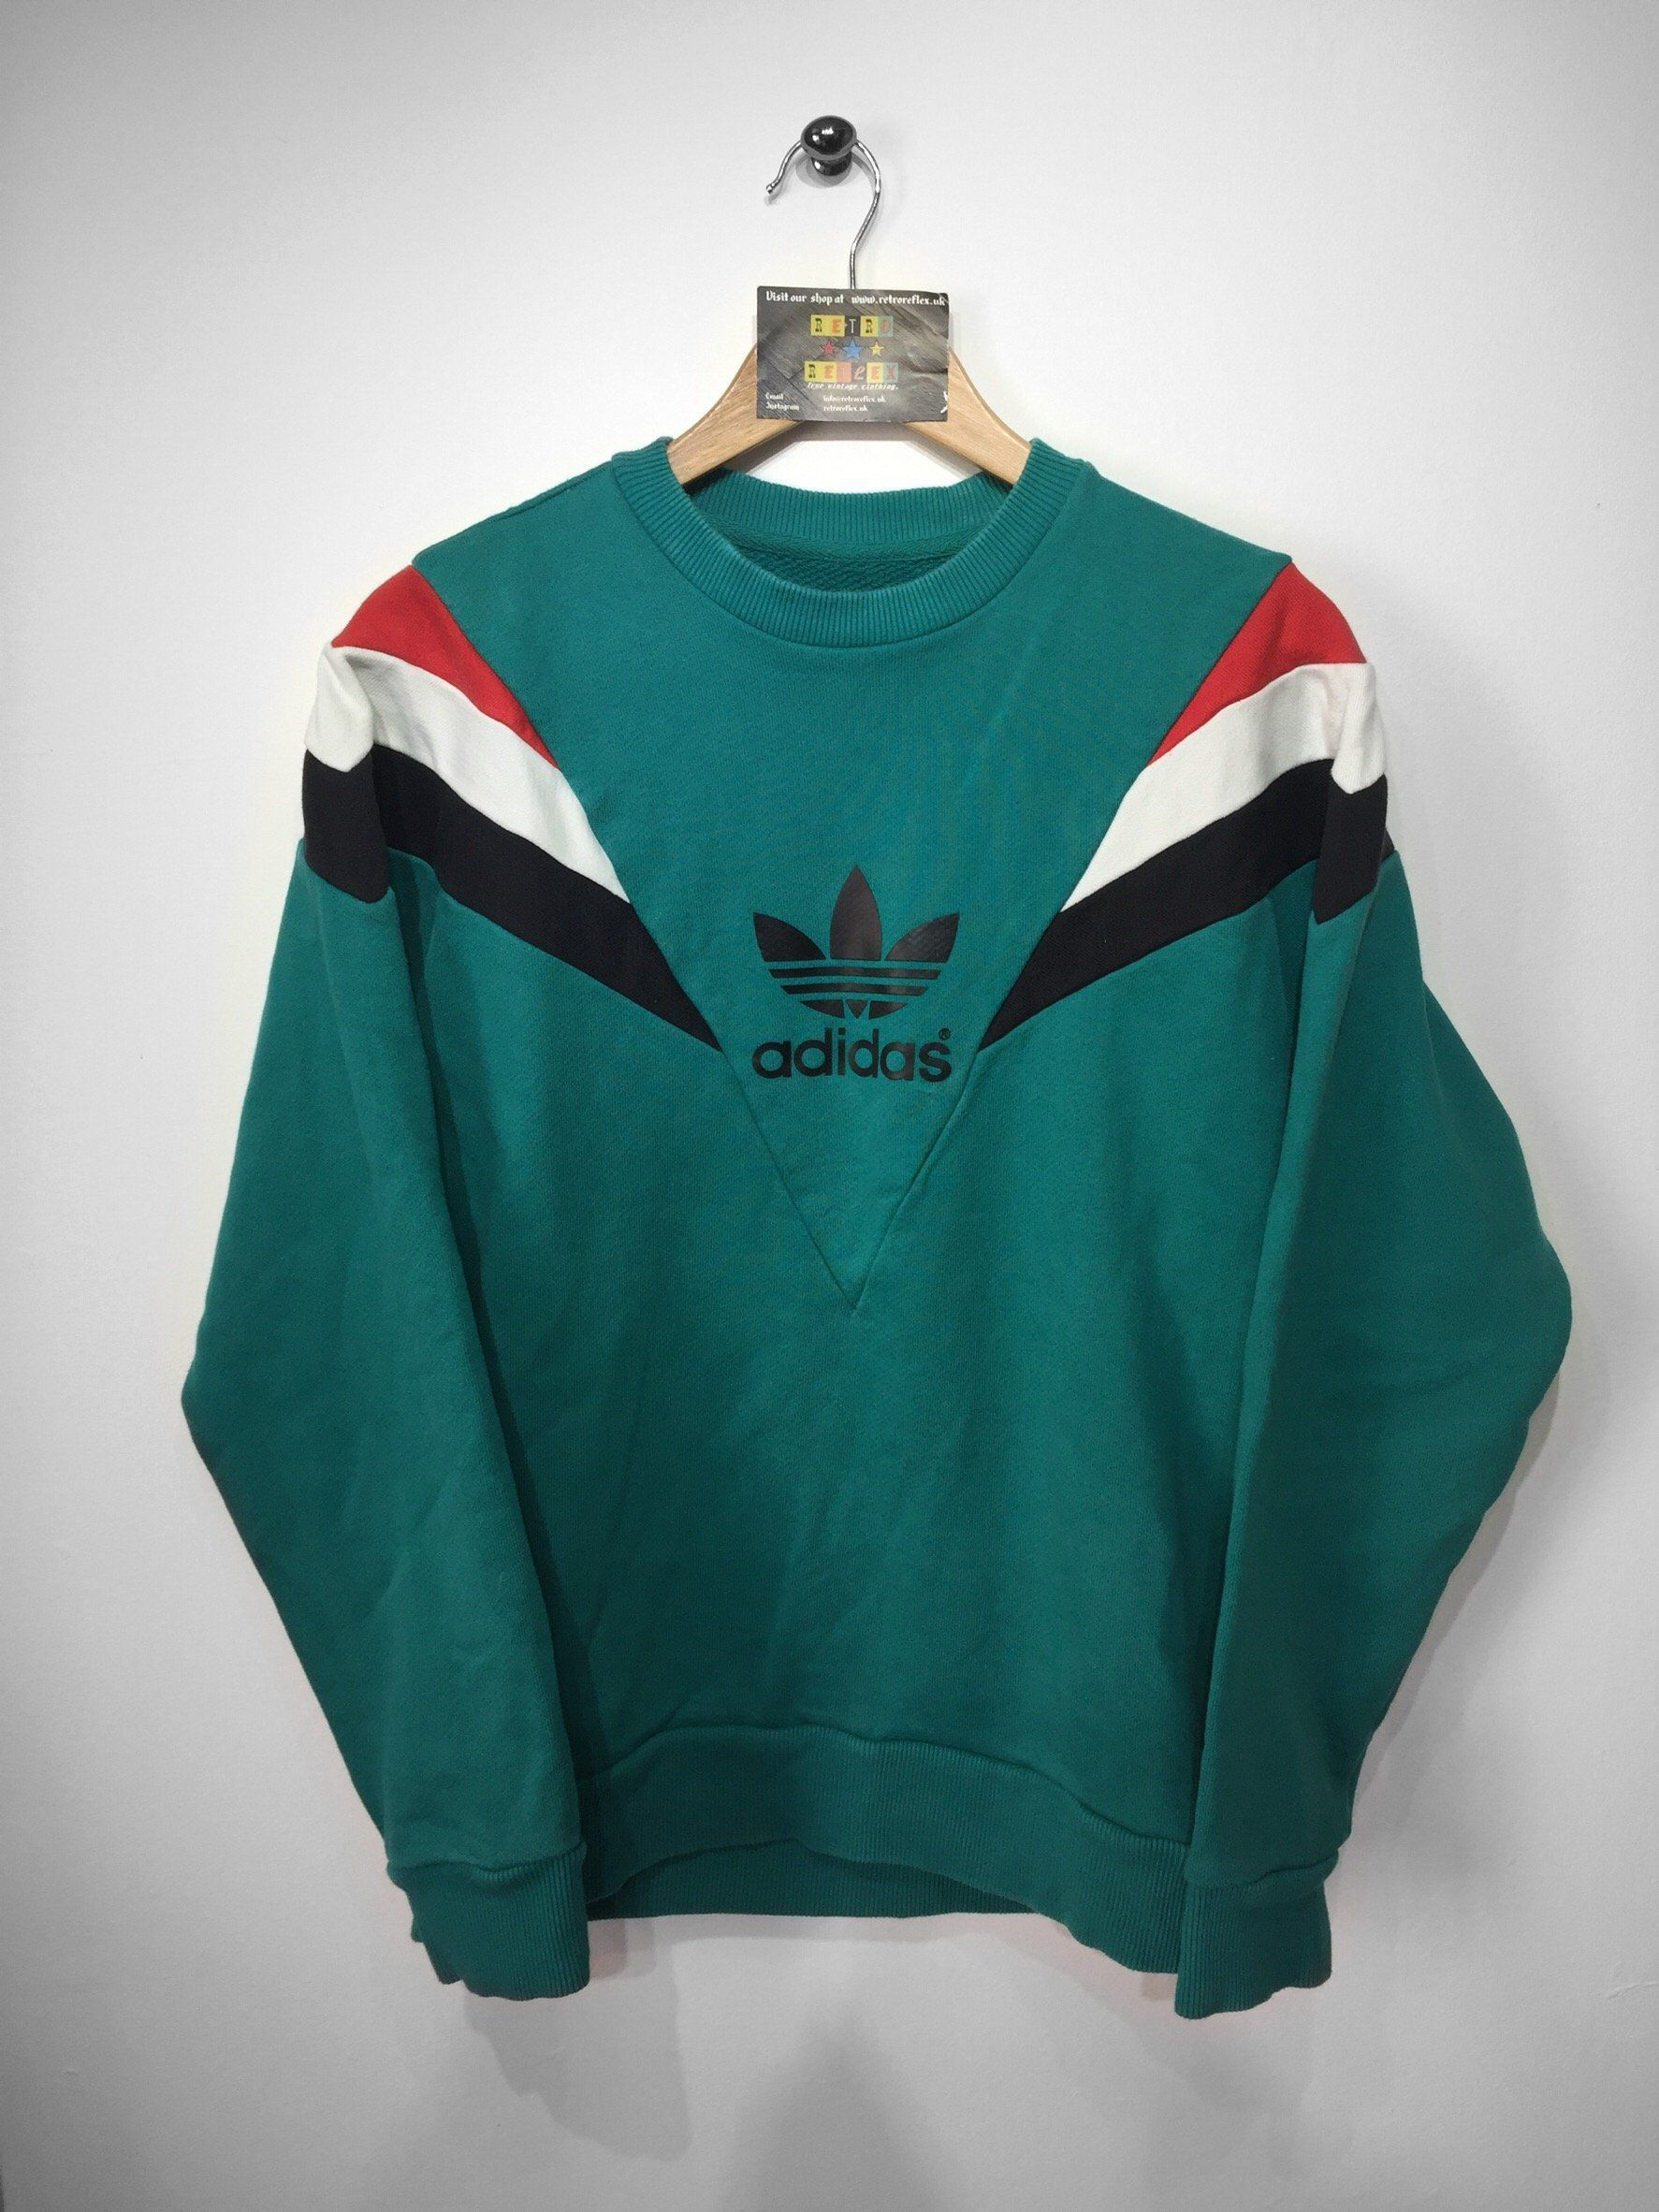 Adidas sweatshirtSIZE M (MEDIUM) .Adidas lettering and